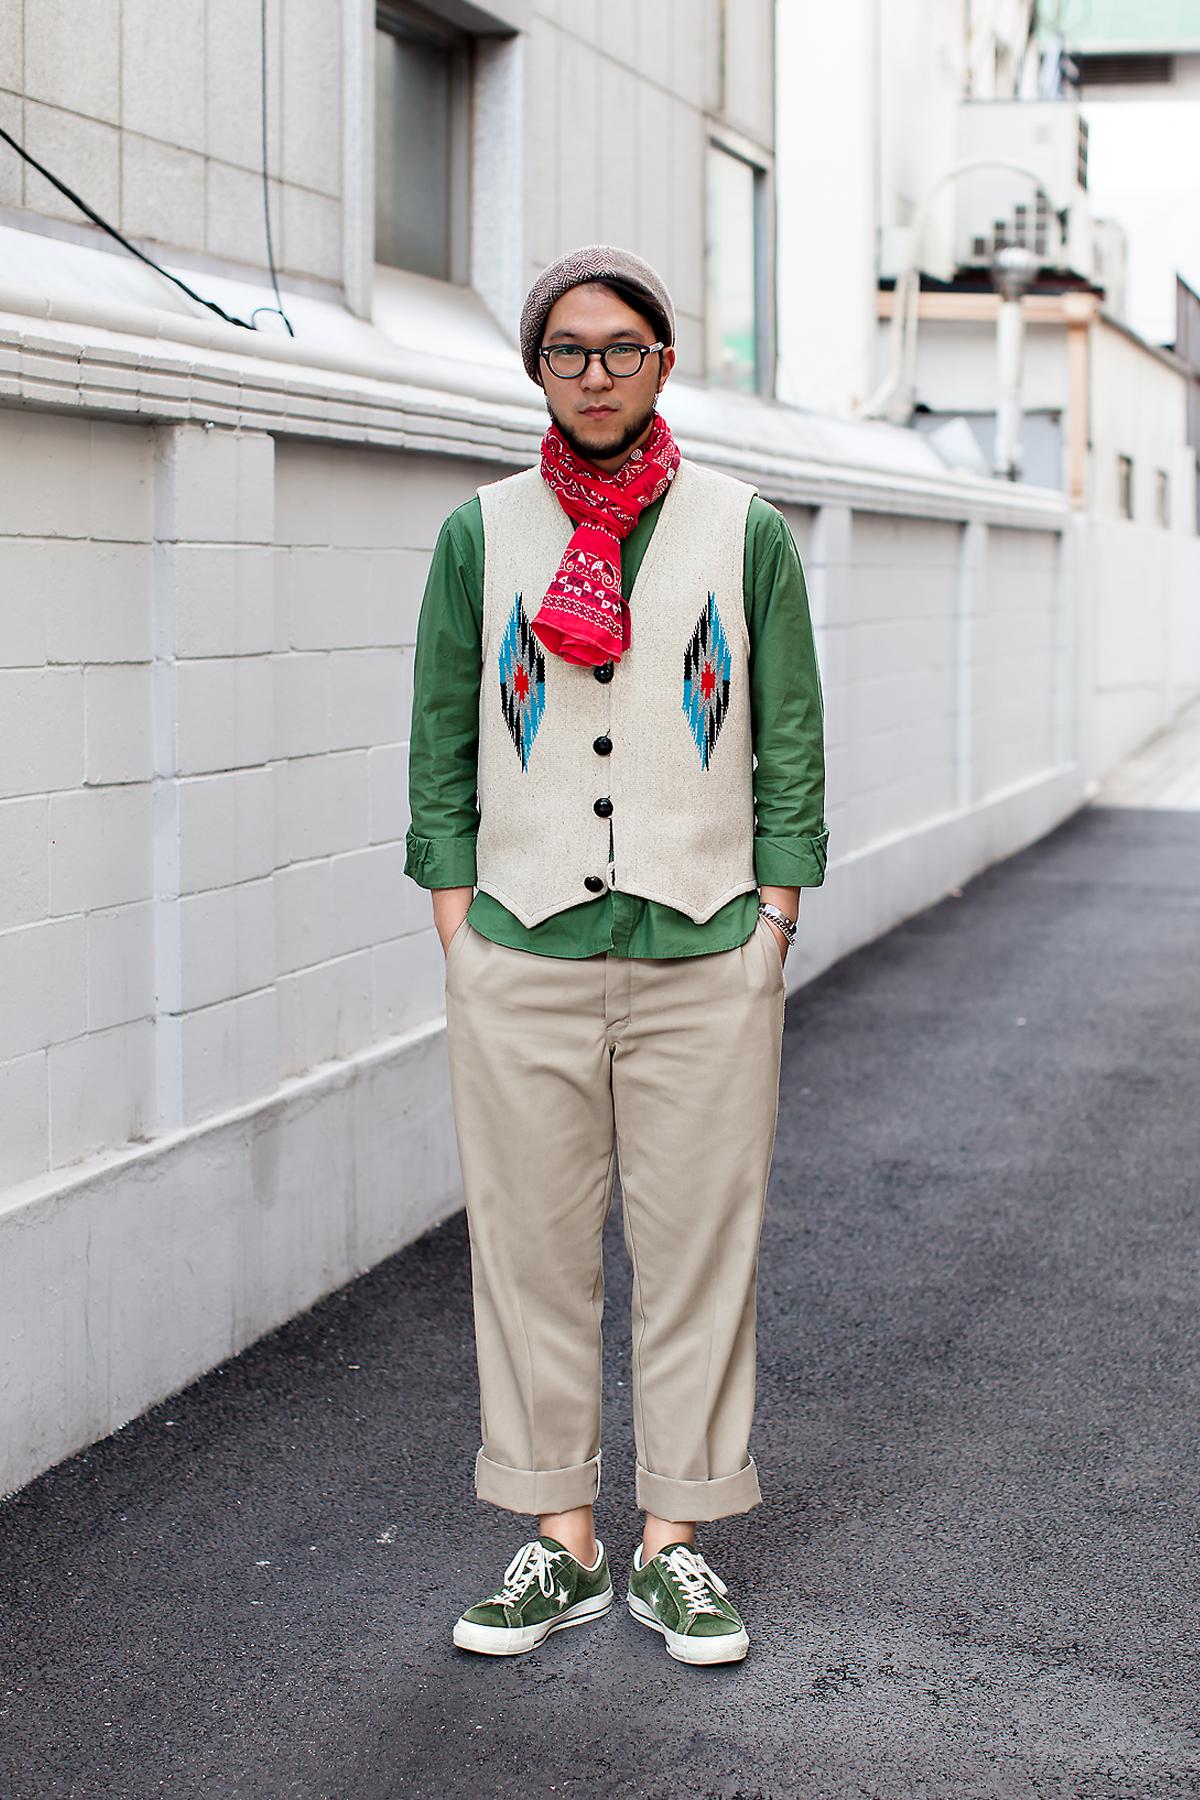 Kim Taejong, Street Fashion 2017 in Seoul